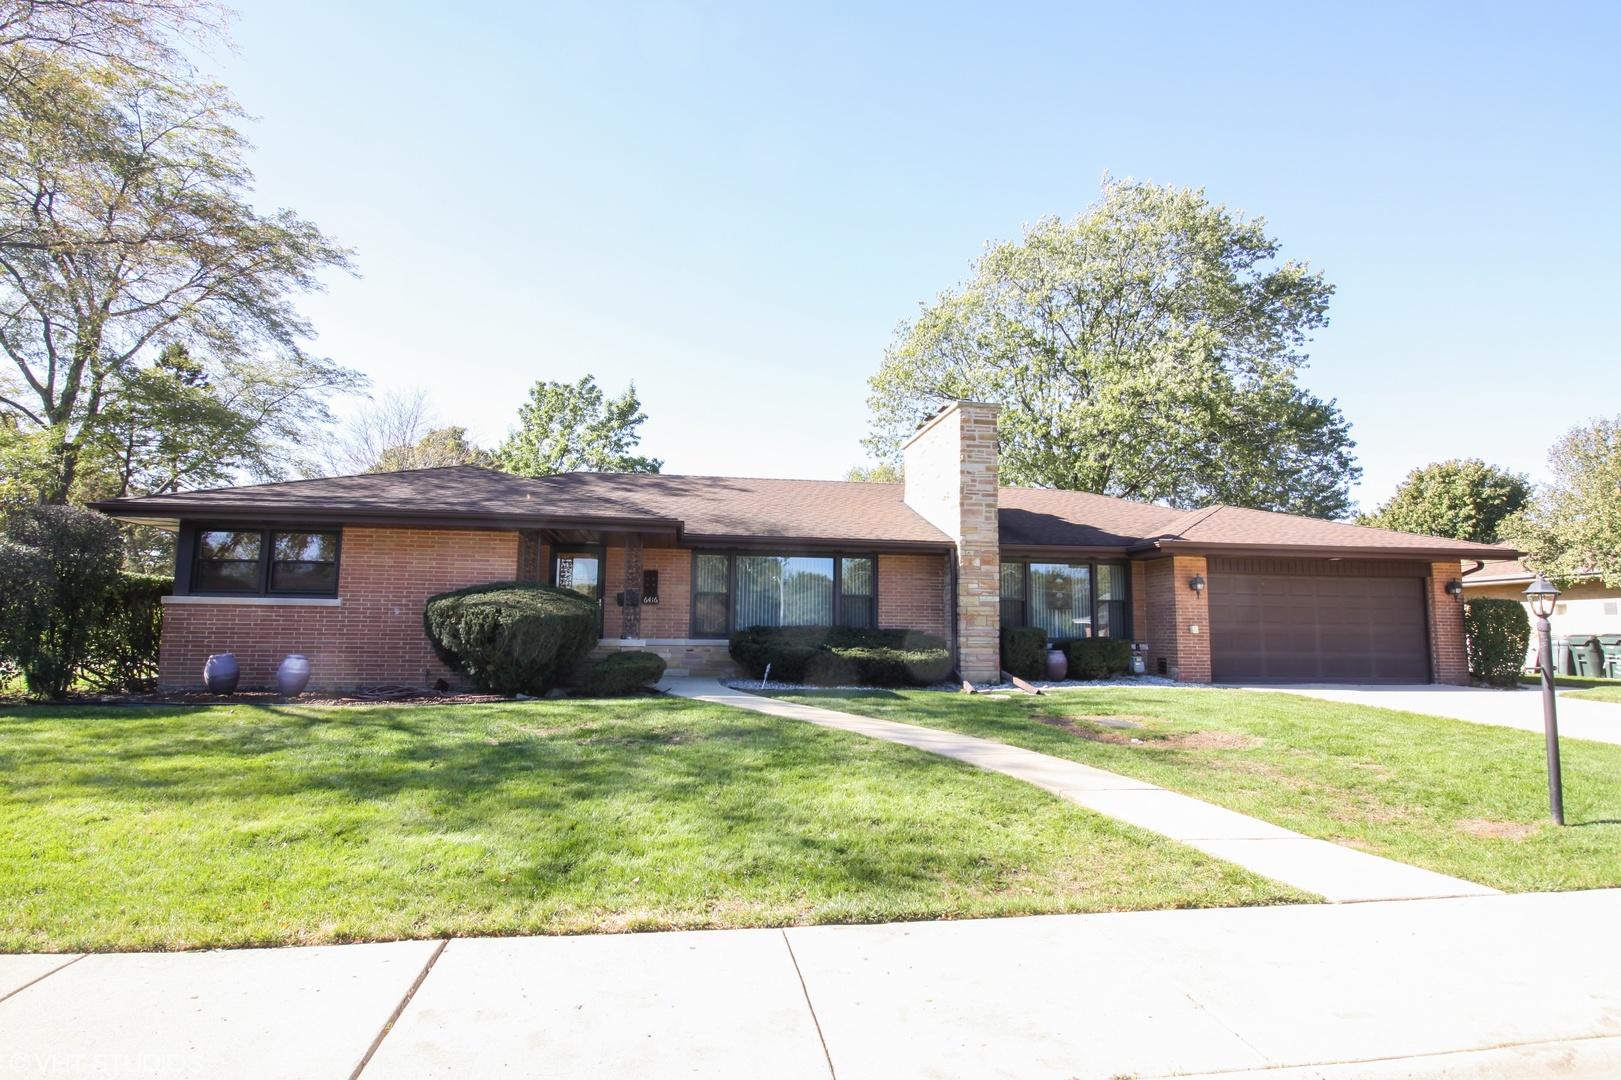 6416 Palma ,Morton Grove, Illinois 60053